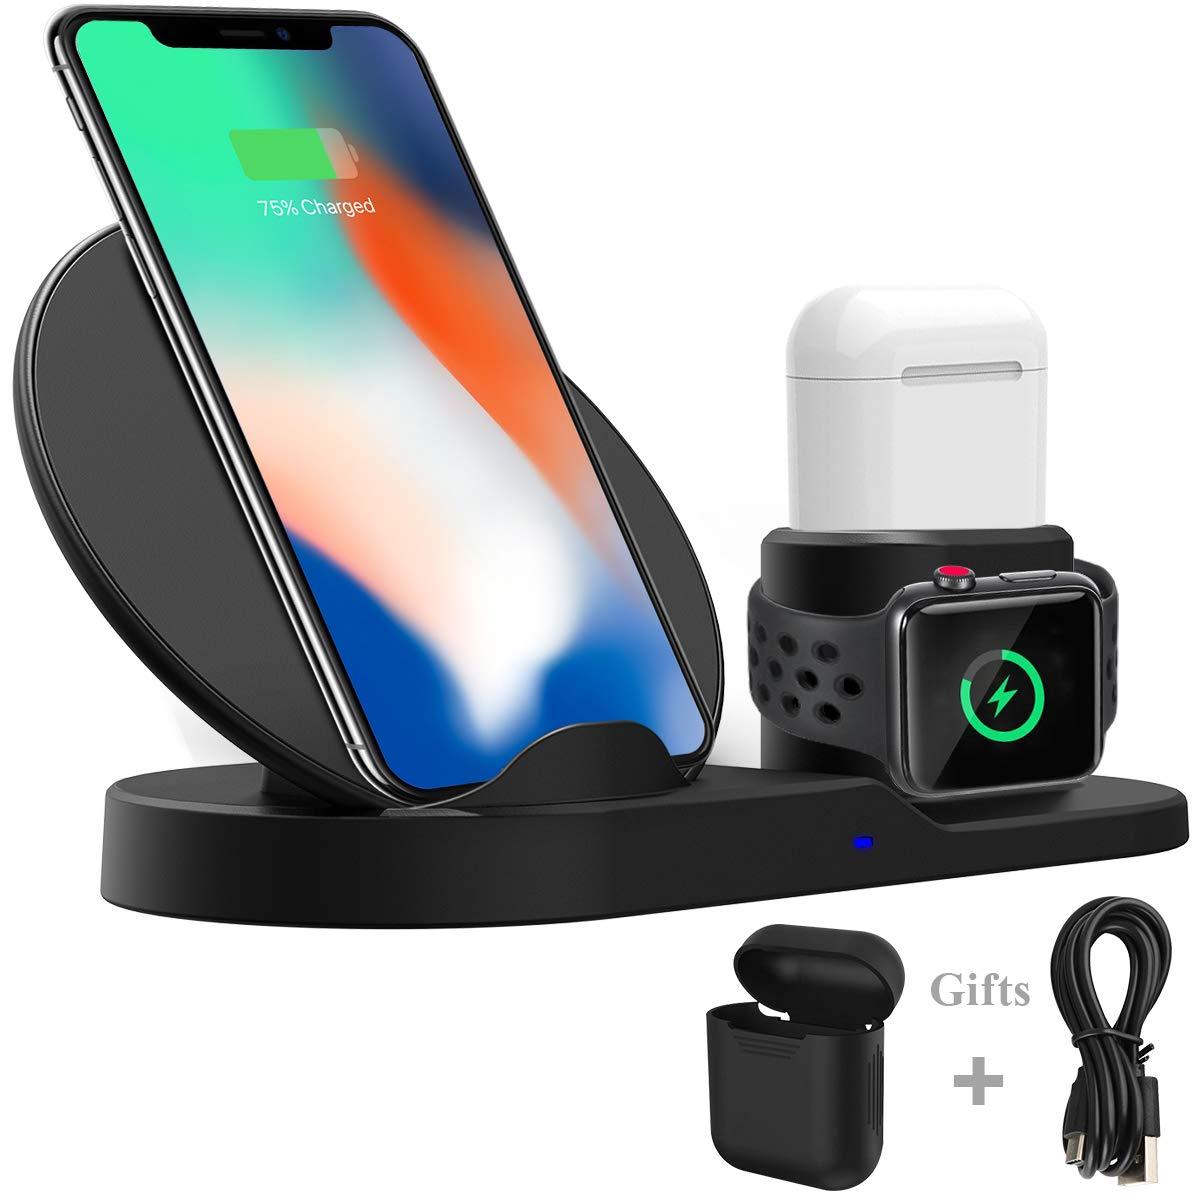 Wonsidary Cargador para Apple, Muelles De Carga Teléfono Estación De Carga Soporte Cargador inalámbrico para Apple Watch Series 3/2/1 y AirPods, ...